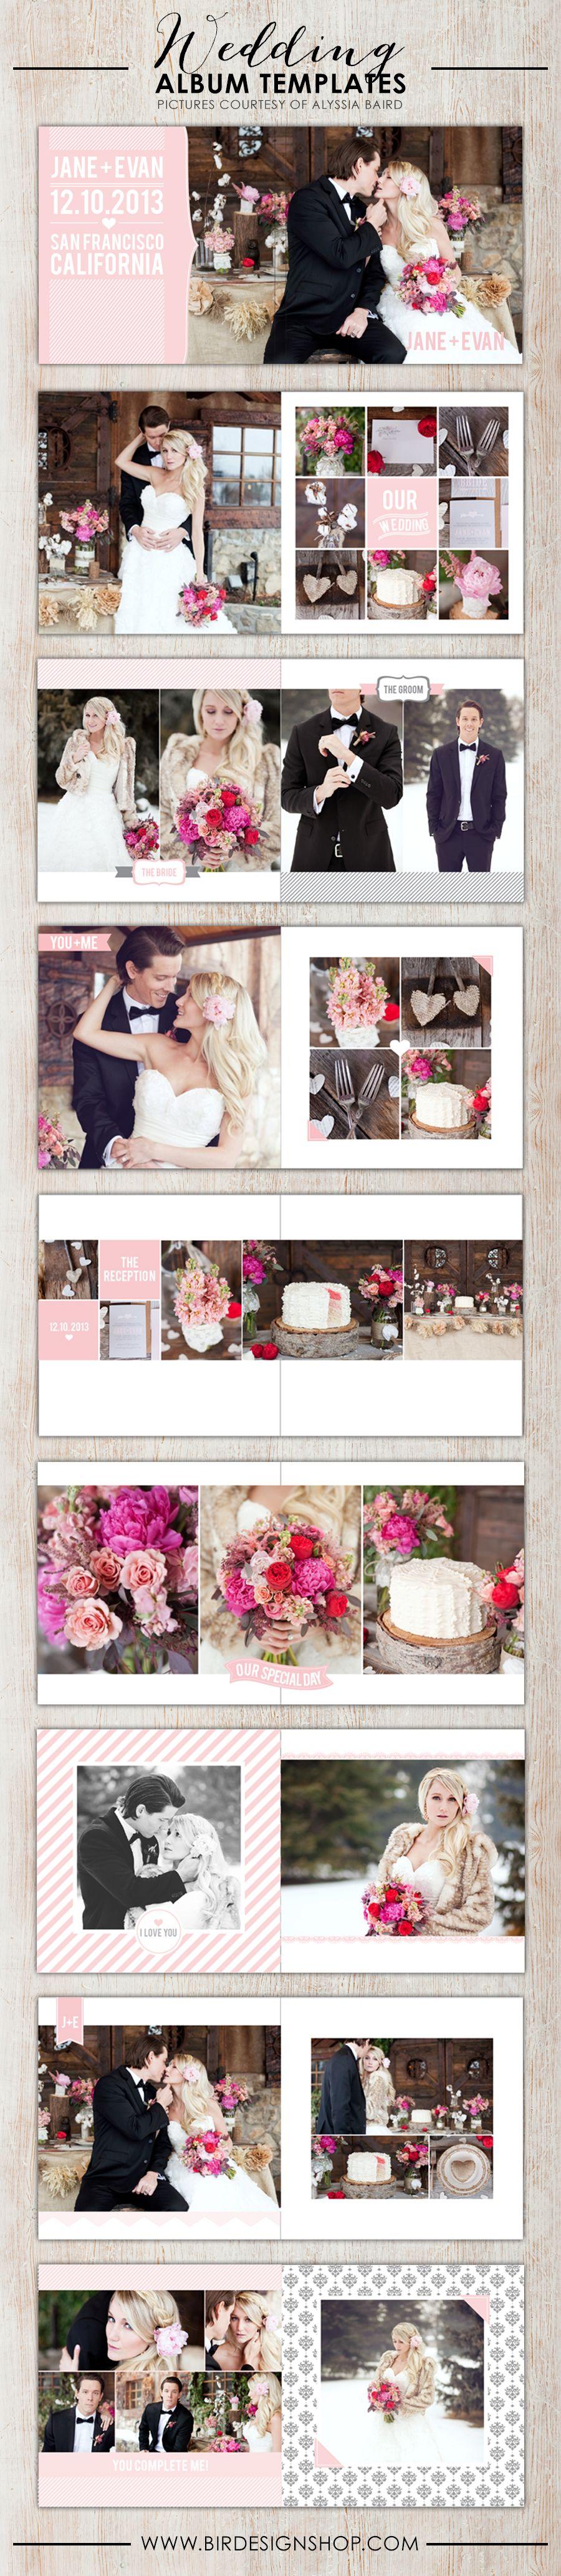 new wedding albums scrapbook ideas by stephanie fullerton